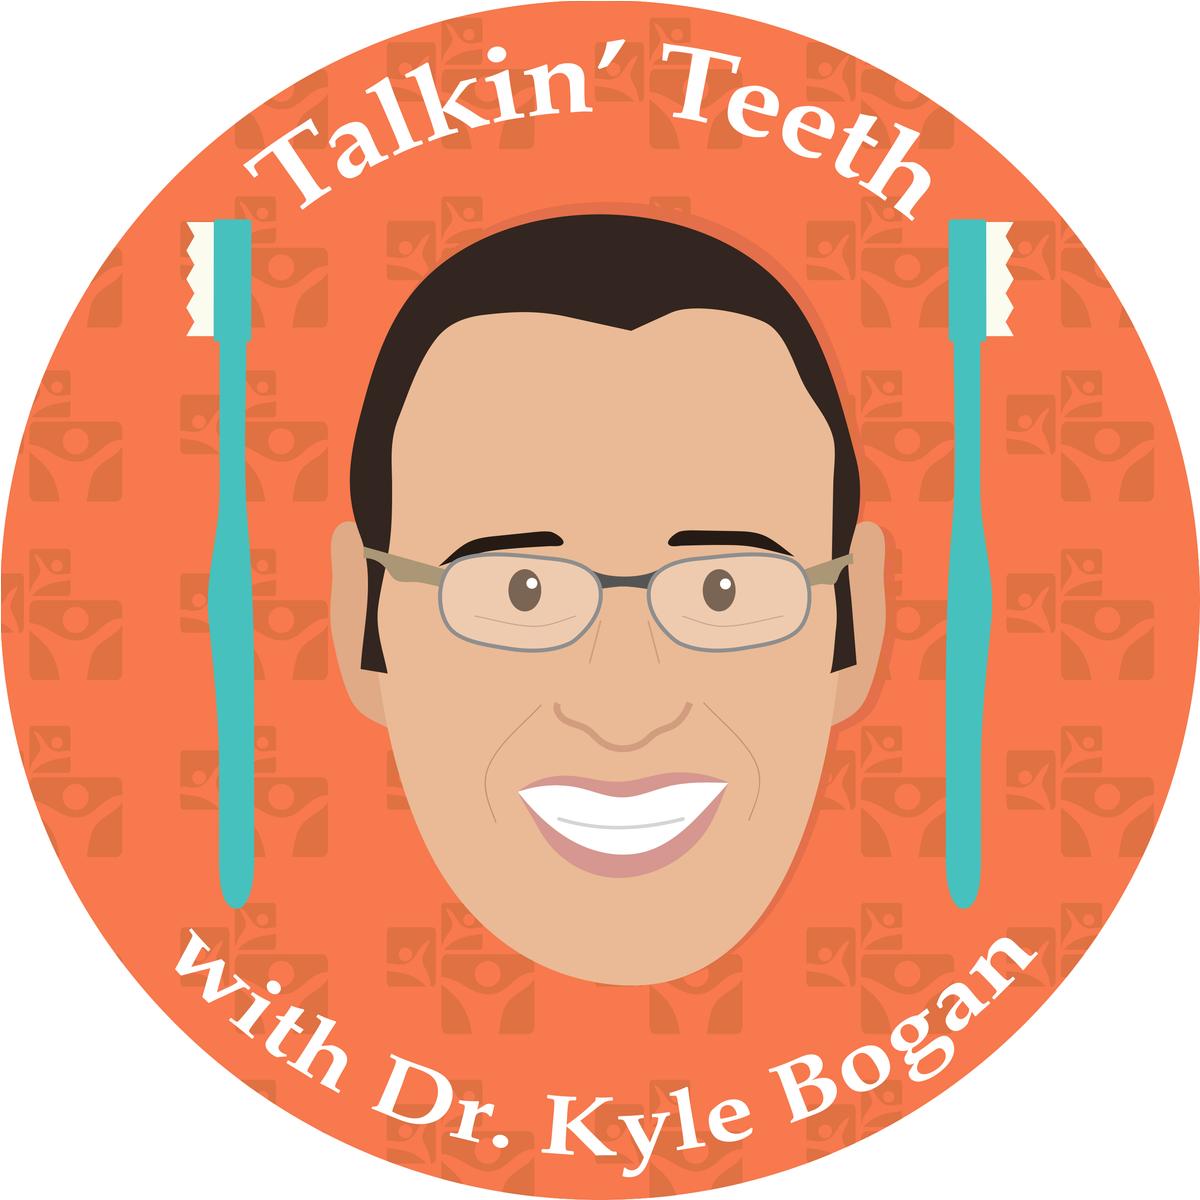 North Orange Family Dentistry Scholarship, Dental Implants